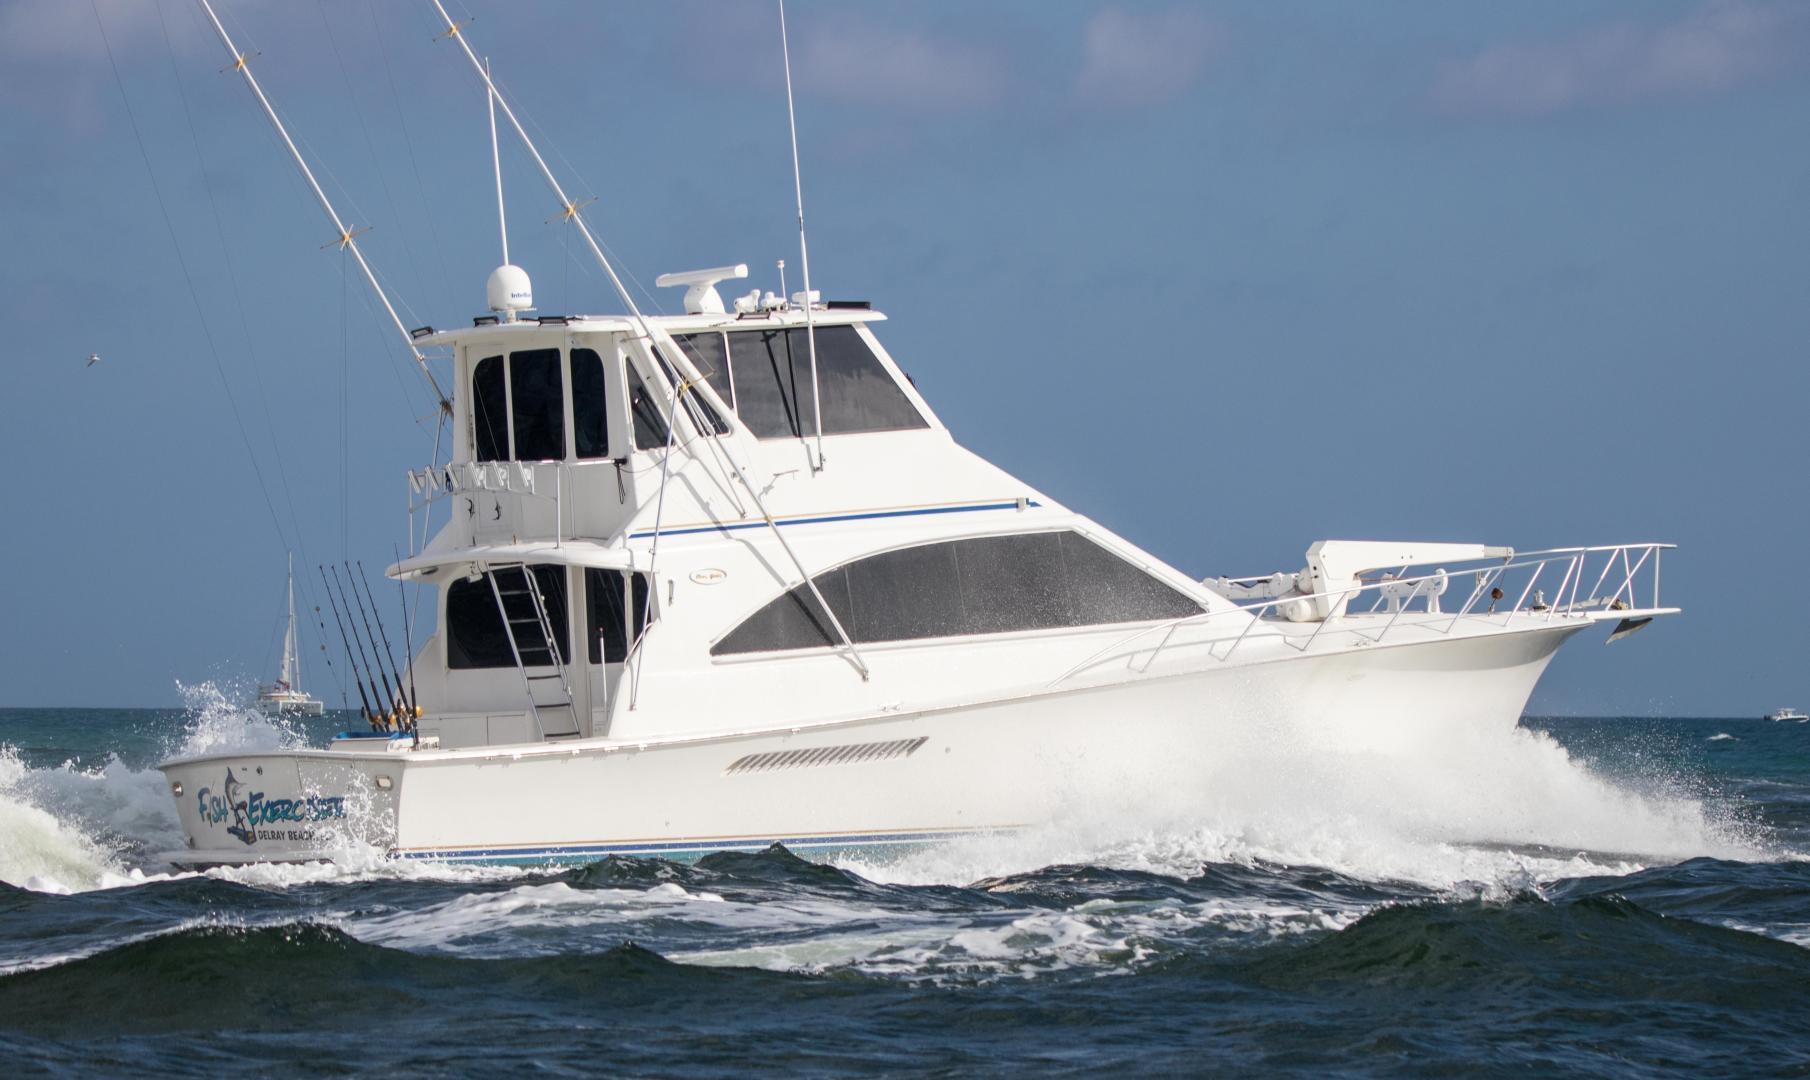 Ocean Yachts 2000-FISH EXERCISER Riviera Beach-Florida-United States-1552089 | Thumbnail